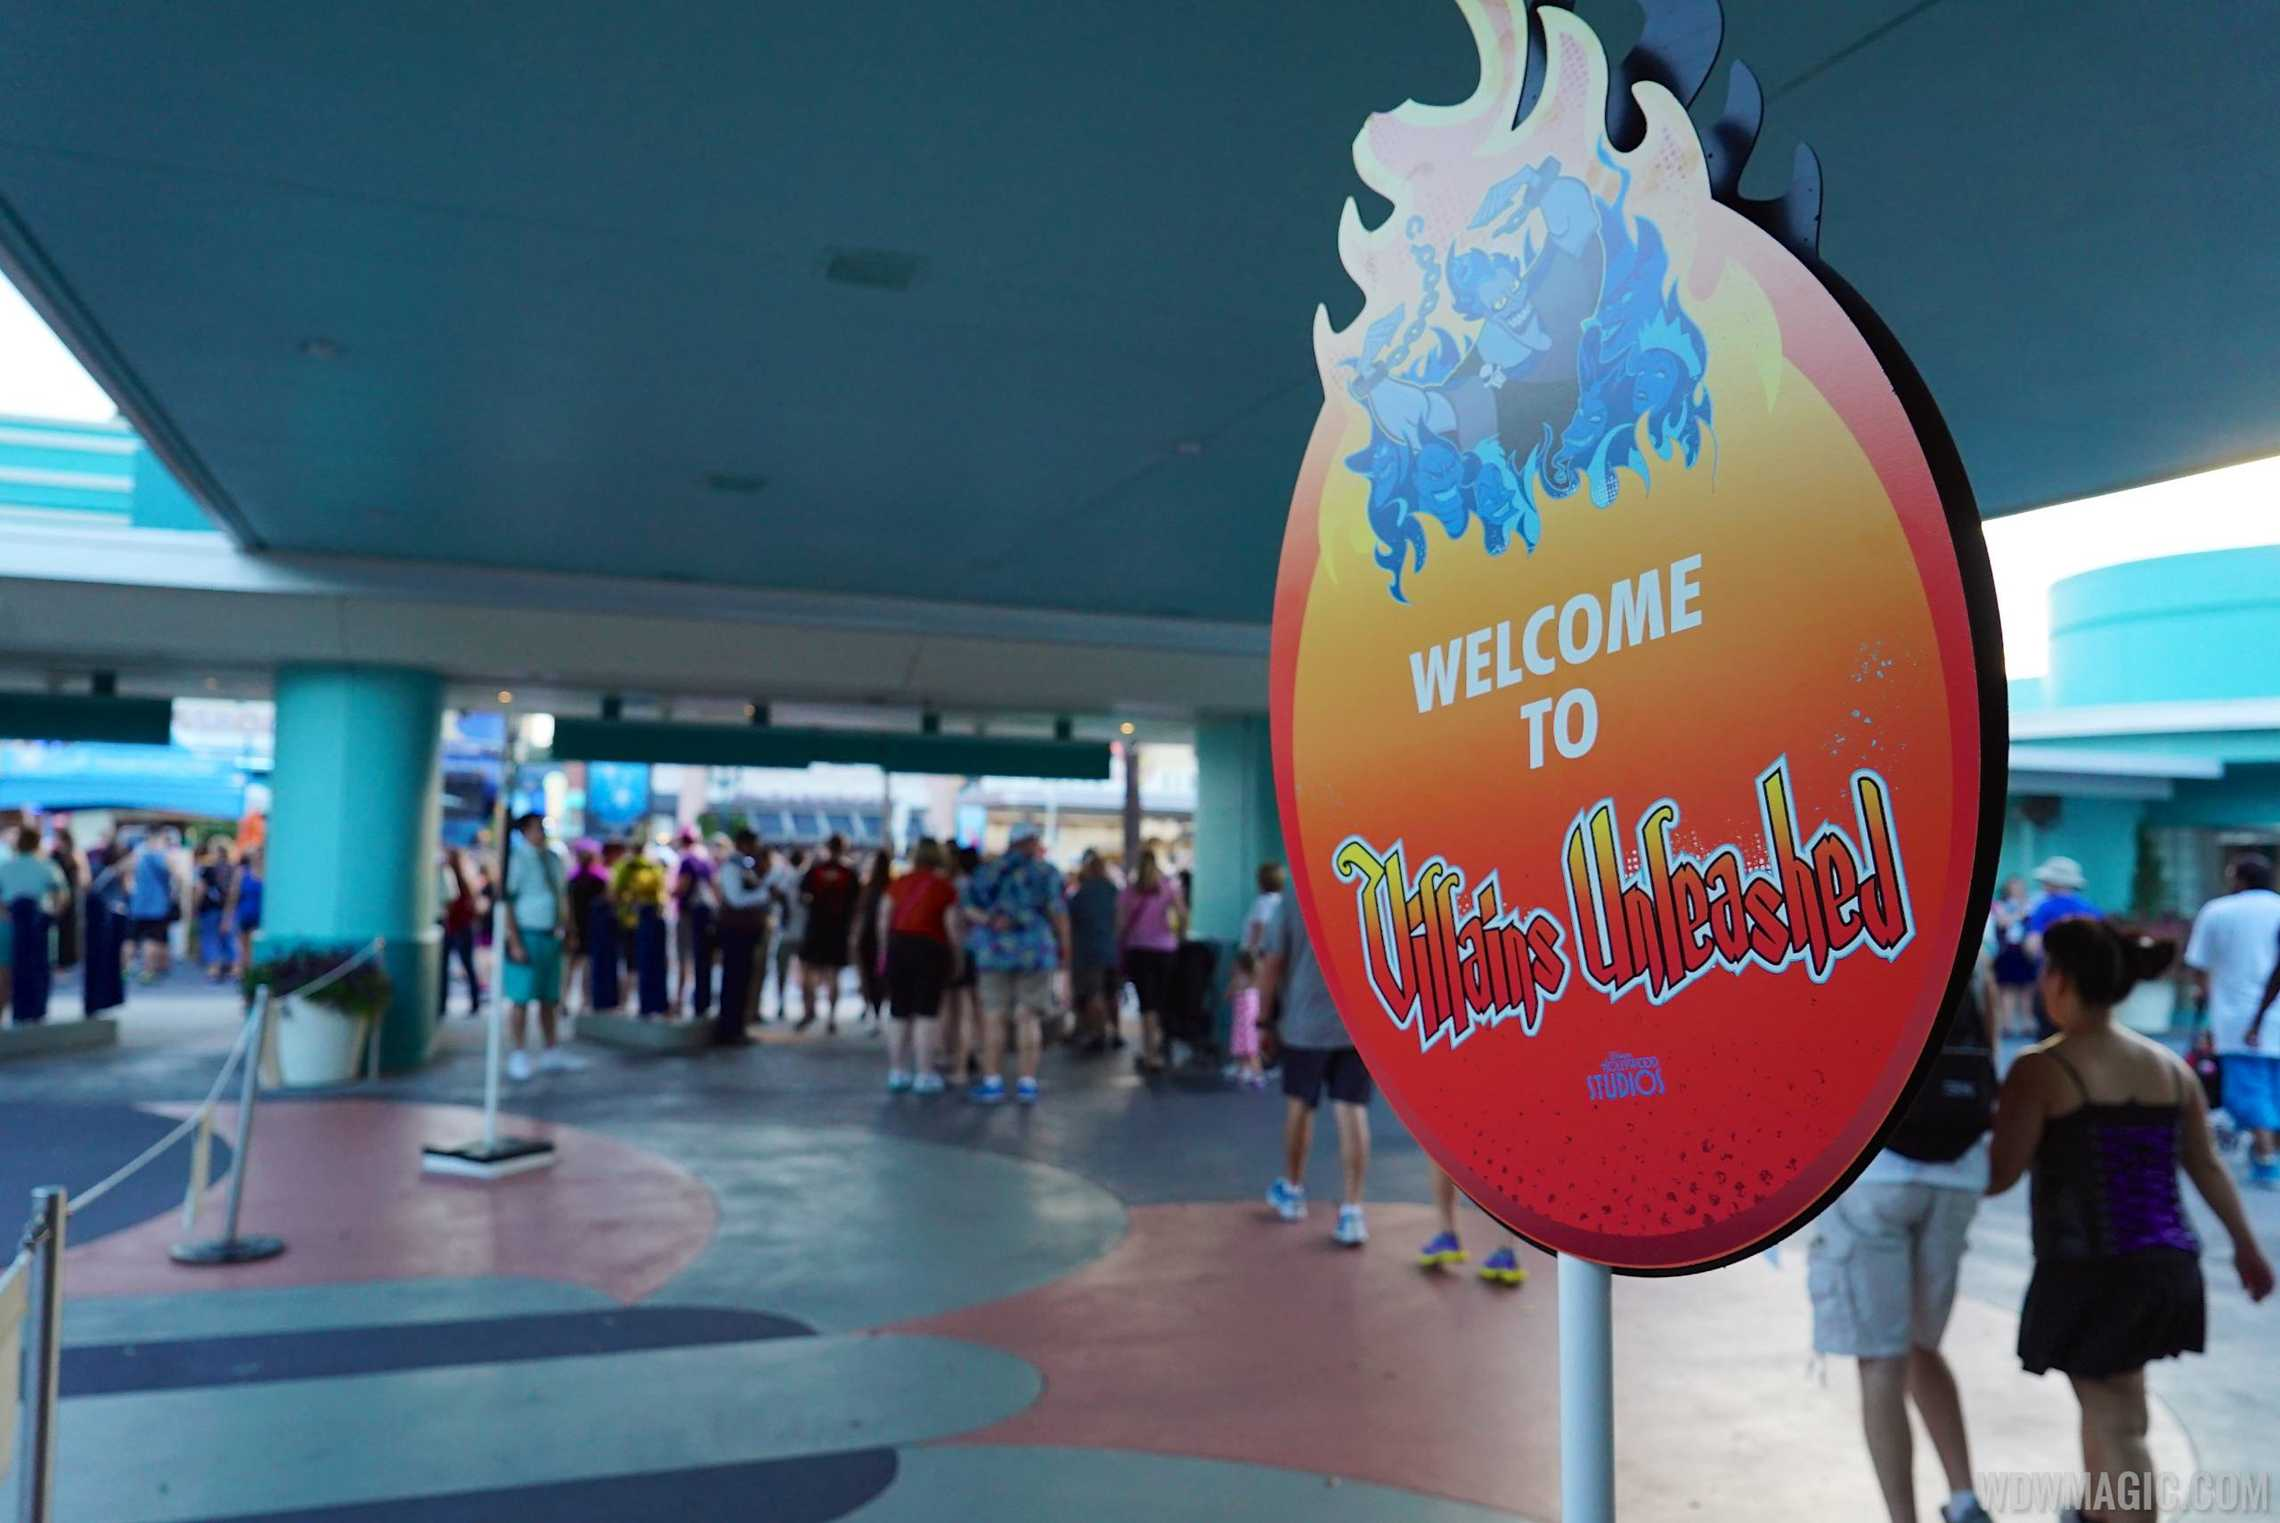 Villains Unleashed - Main Entrance signage